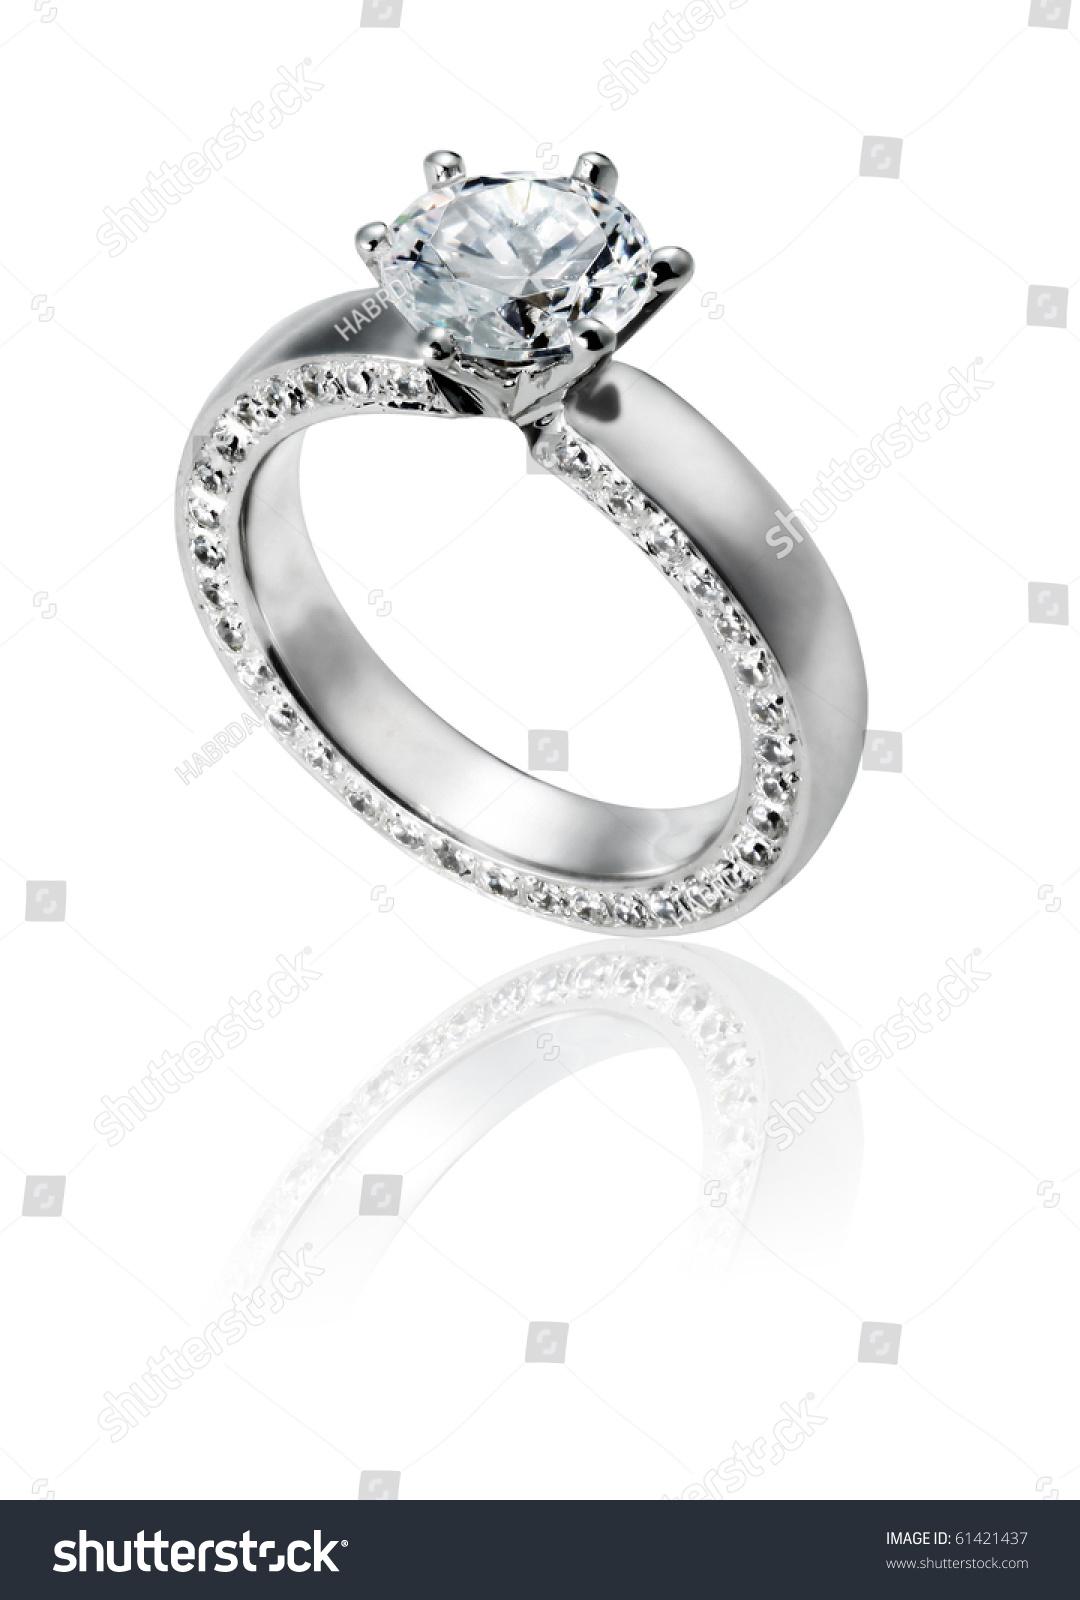 Diamond Ring Wedding Gift Isolated Stock Photo (Royalty Free ...